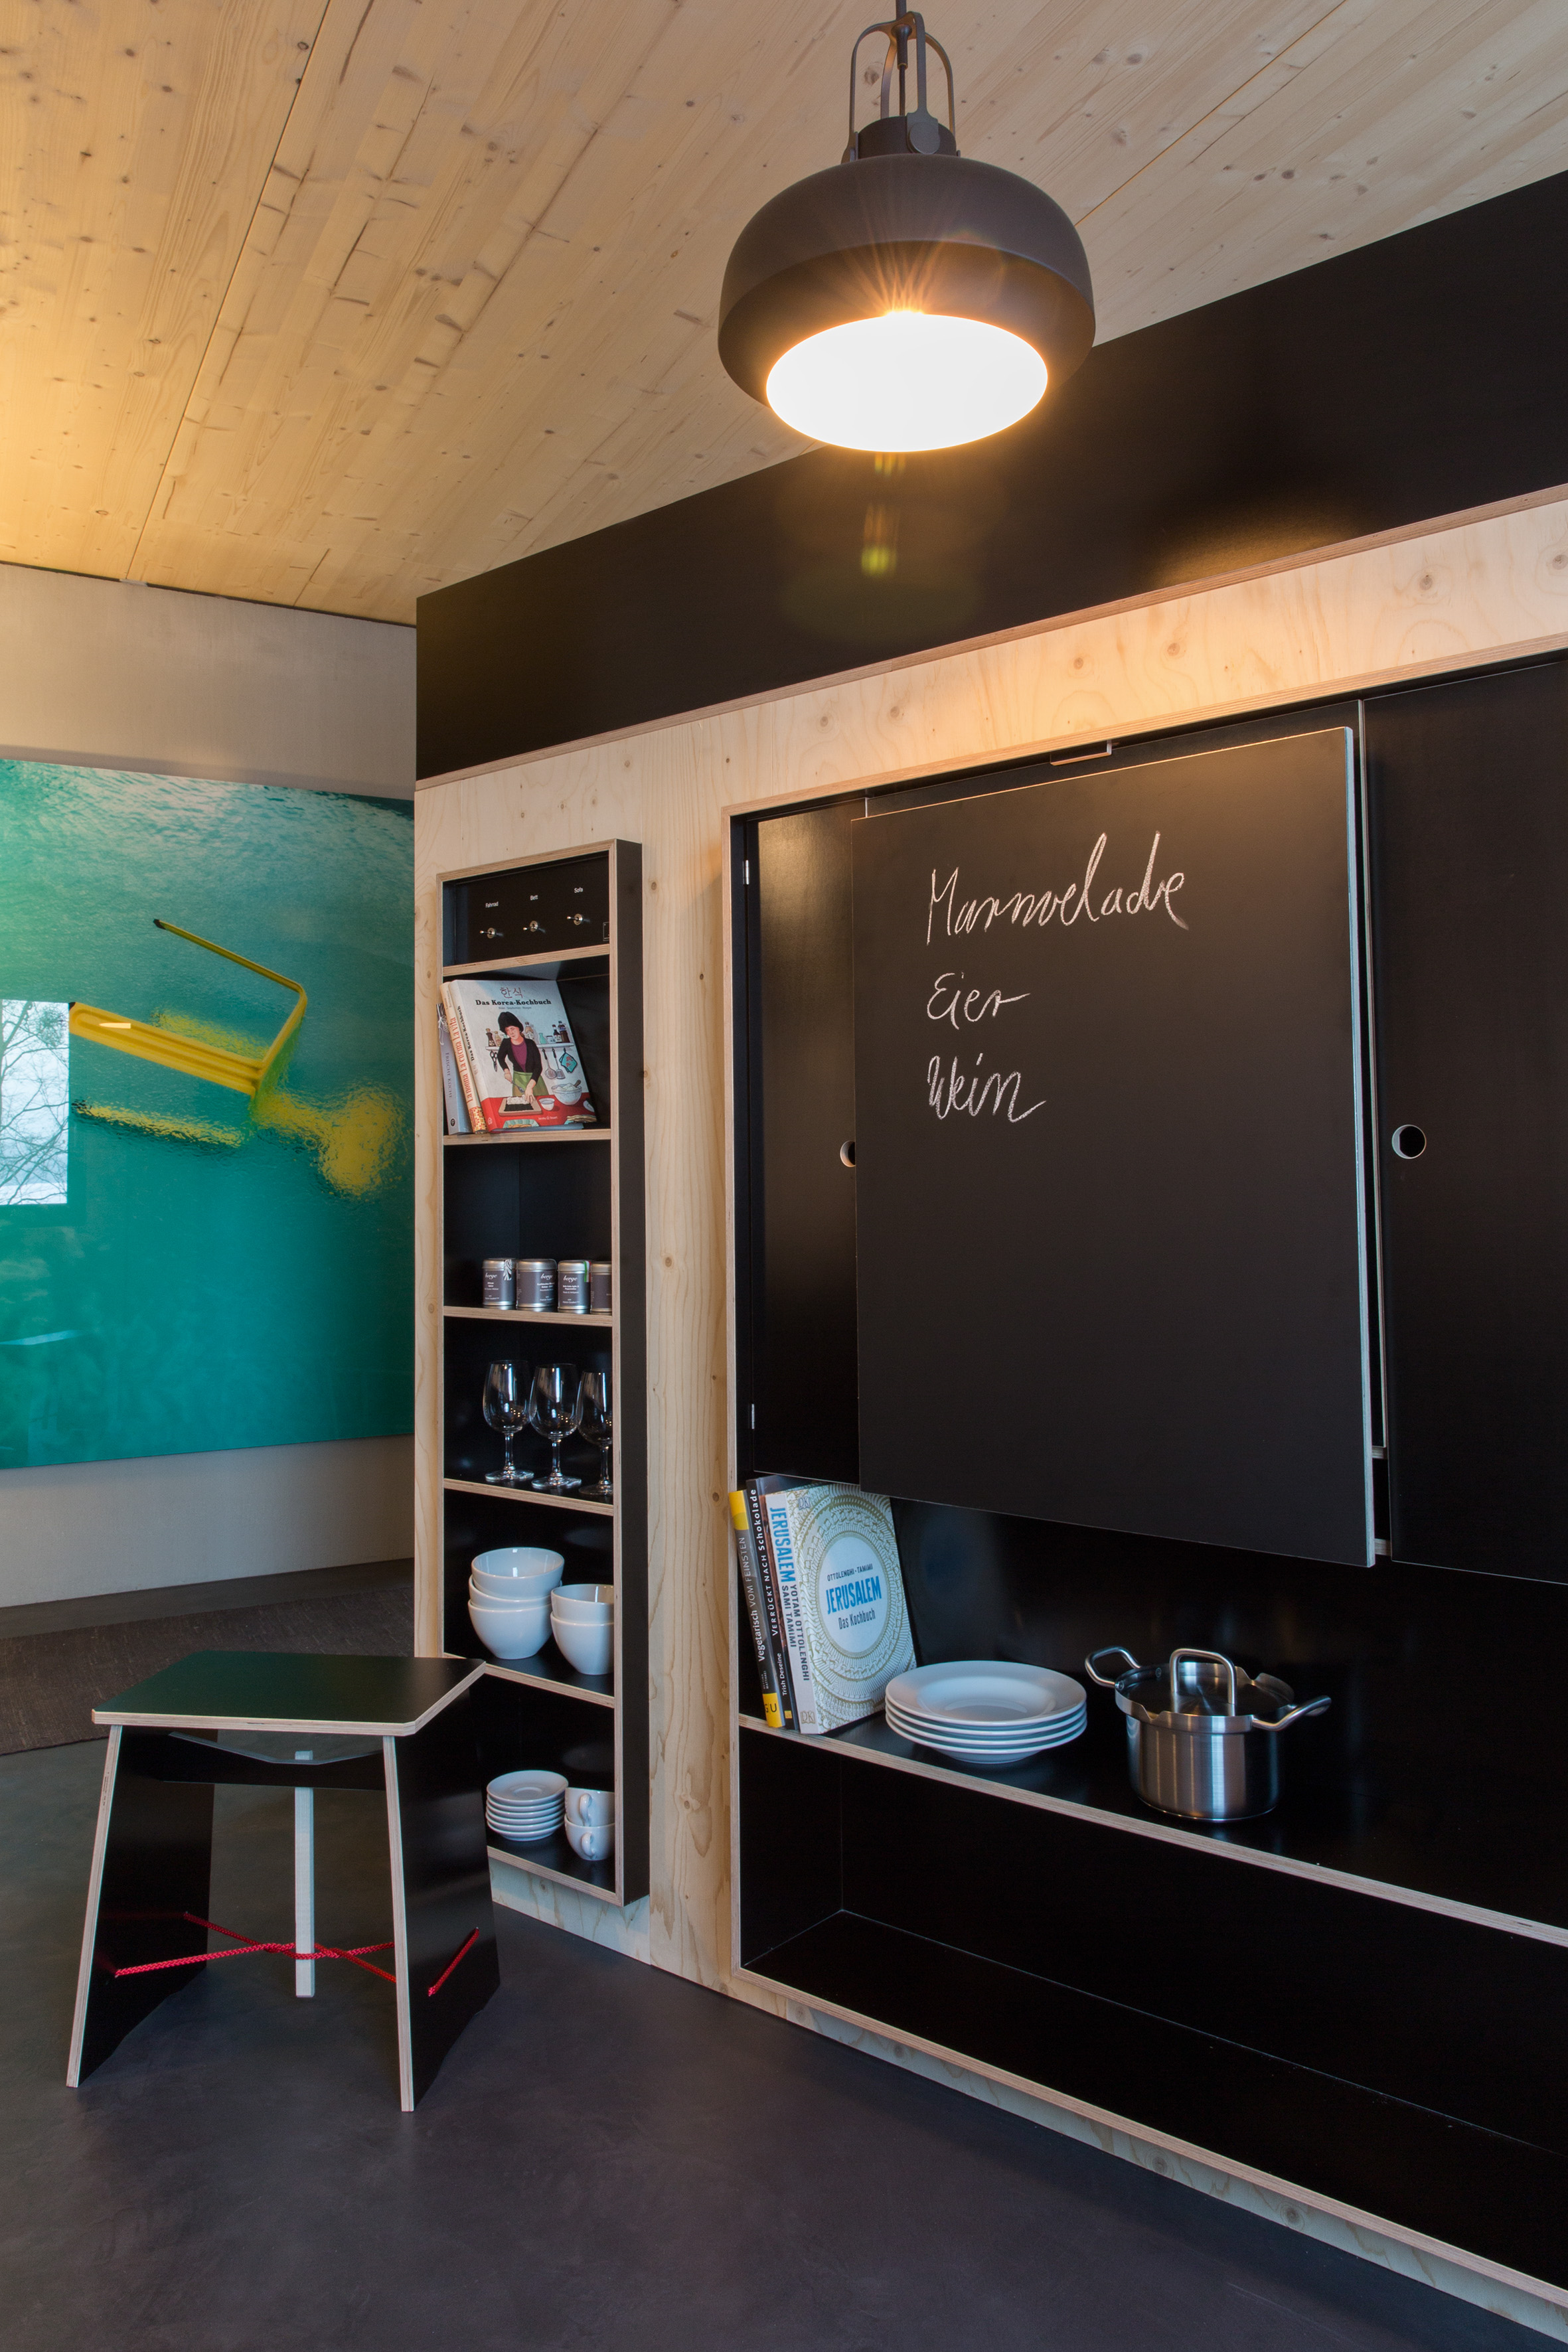 The blackboard folded up | © Julia Rotter